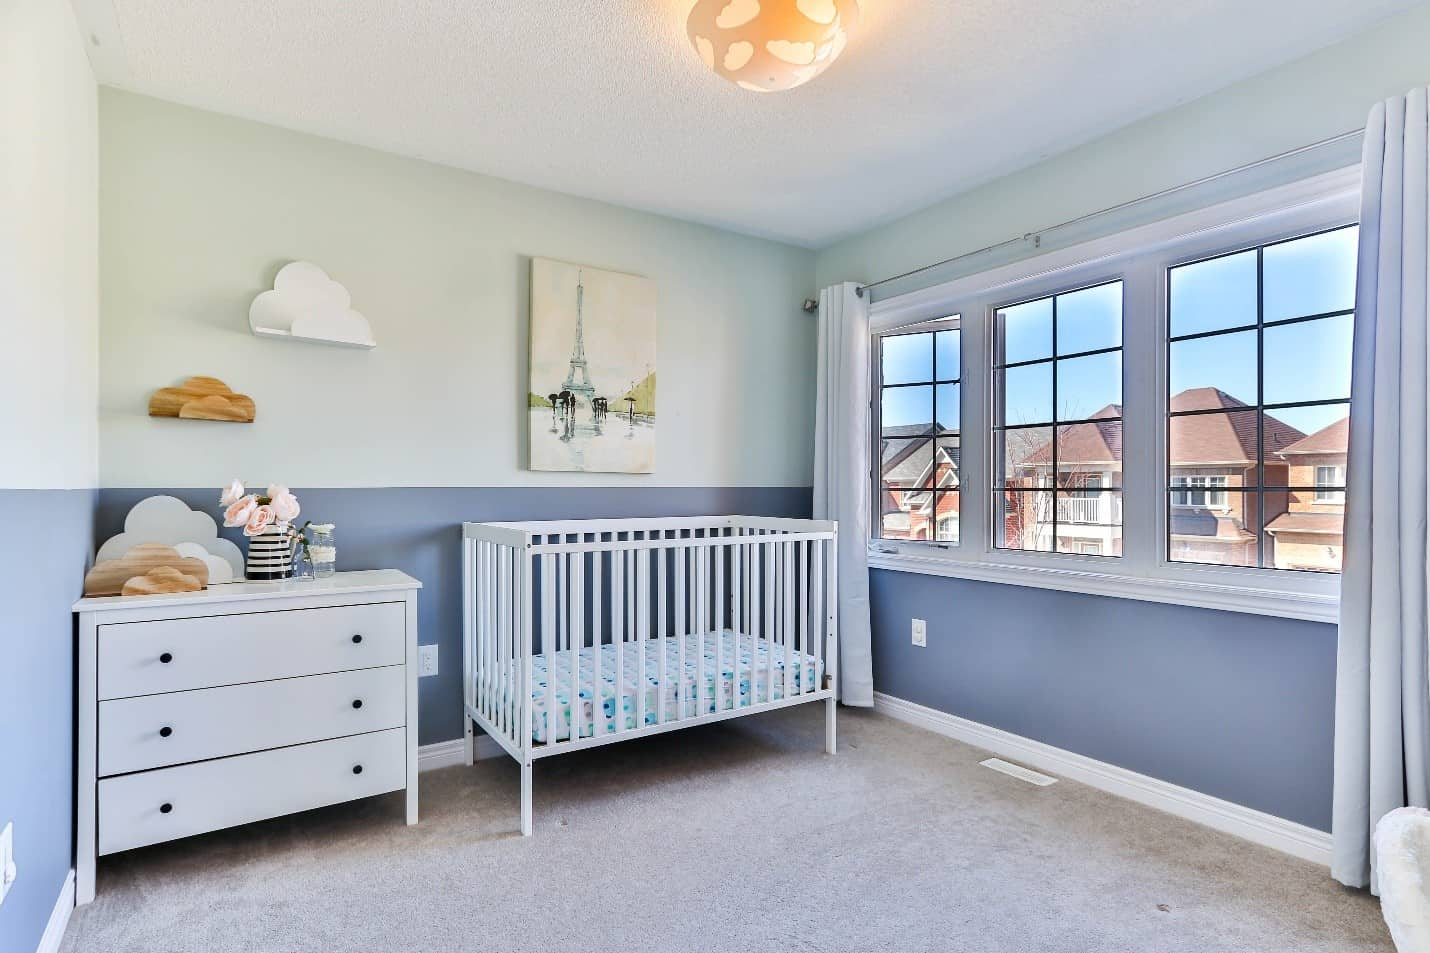 crib bedroom